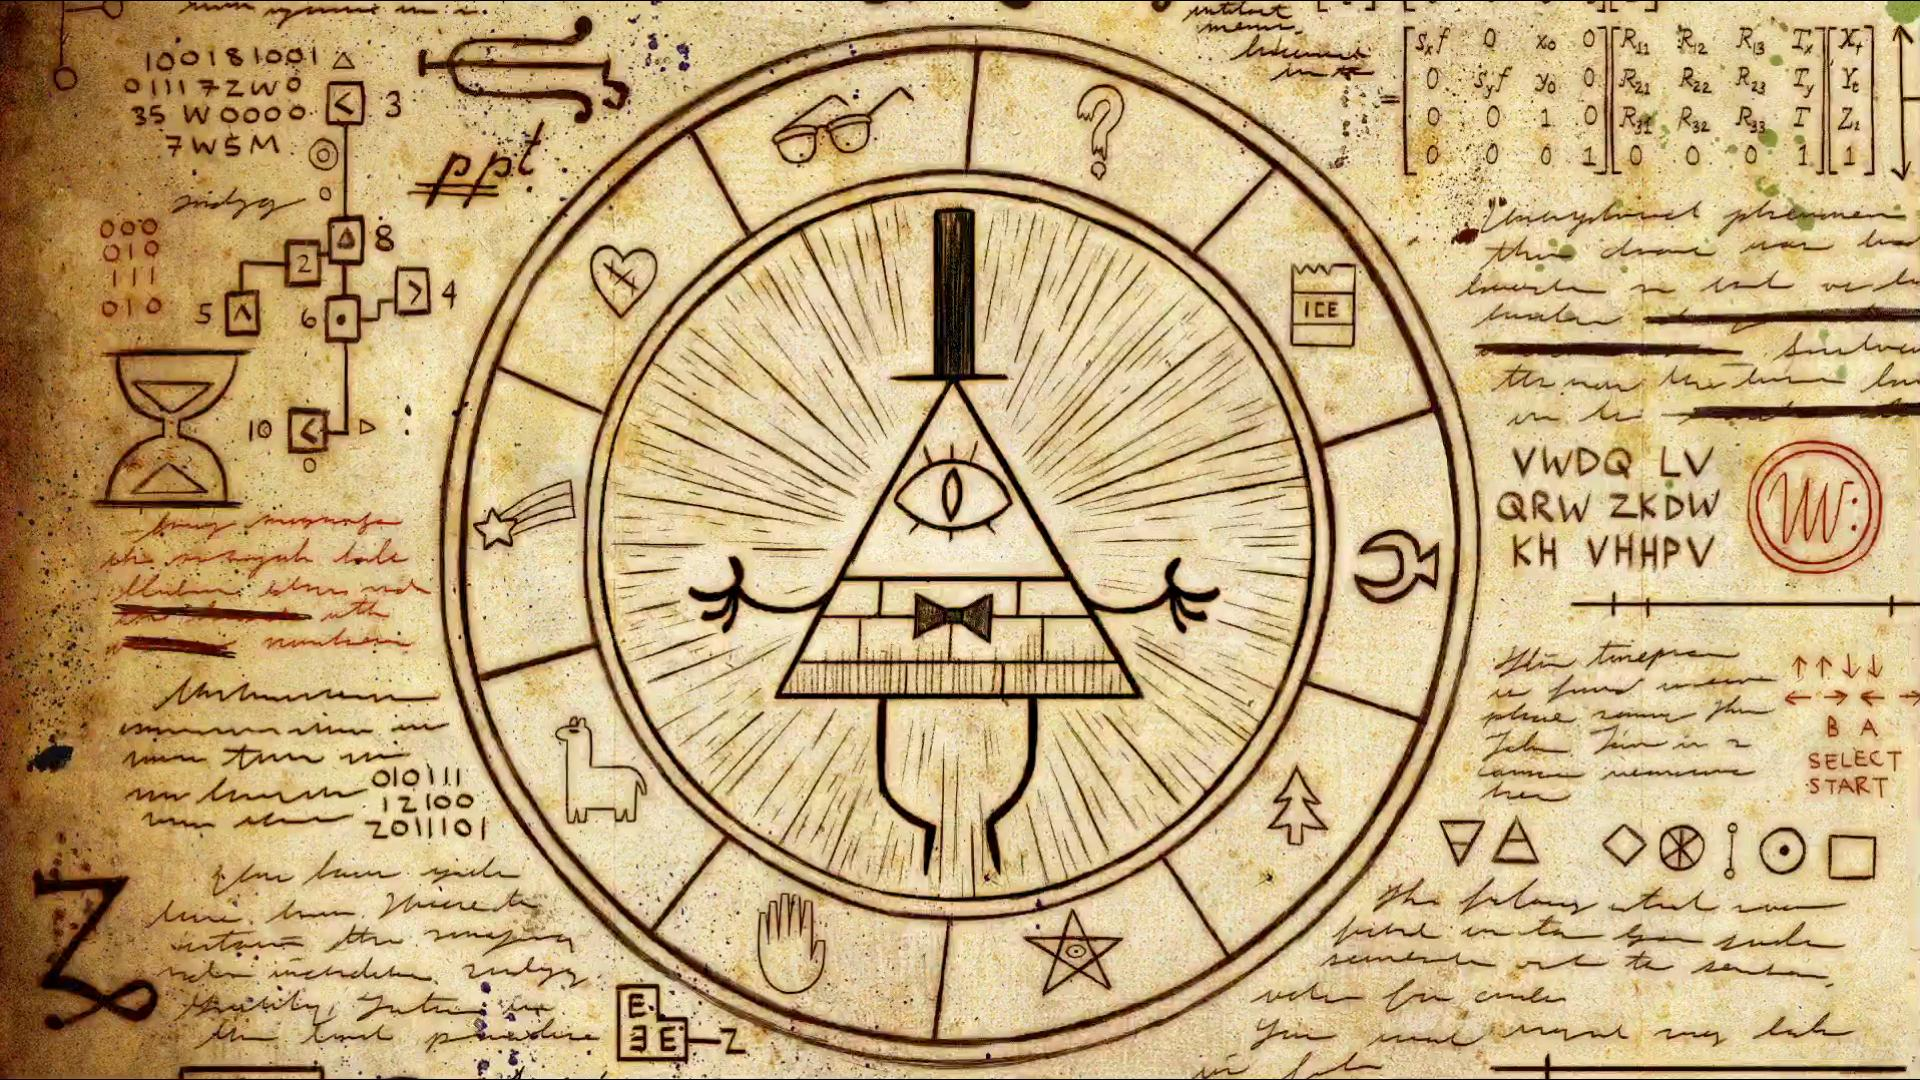 Gravity Falls Wallpaper Hd Android Wallpaper Drawing Illuminati Pentagram Gravity Falls